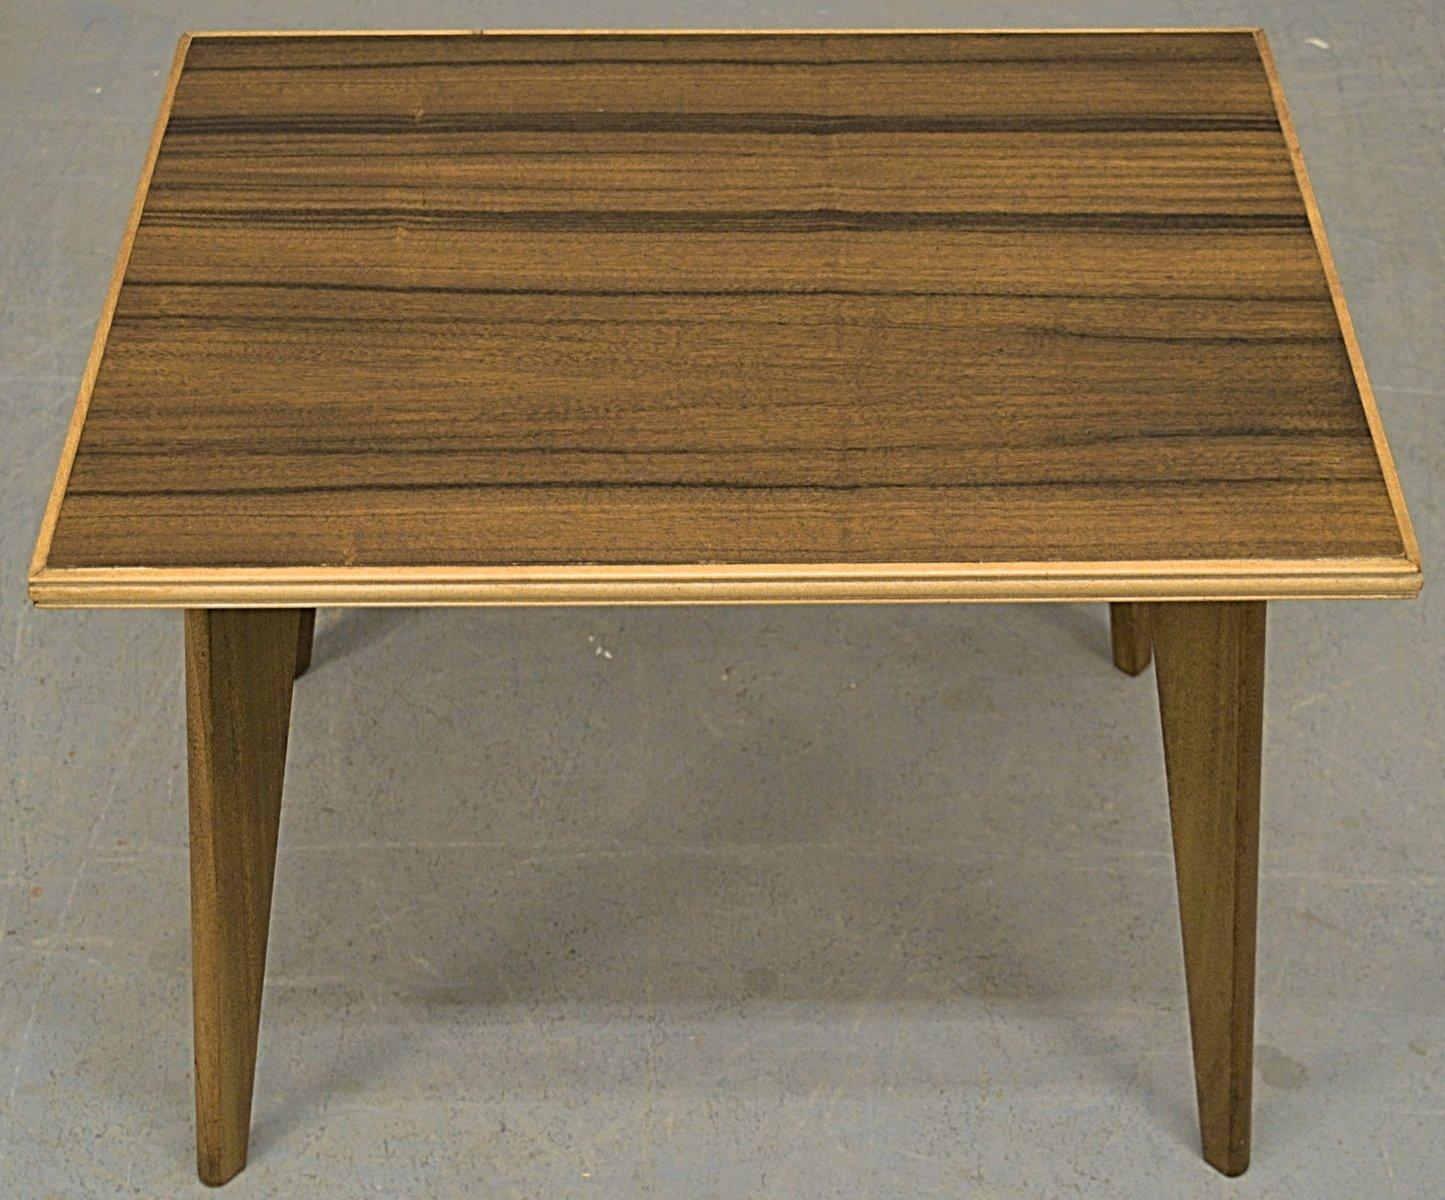 Mid century australian walnut coffee table by morris of glasgow price per piece geotapseo Gallery